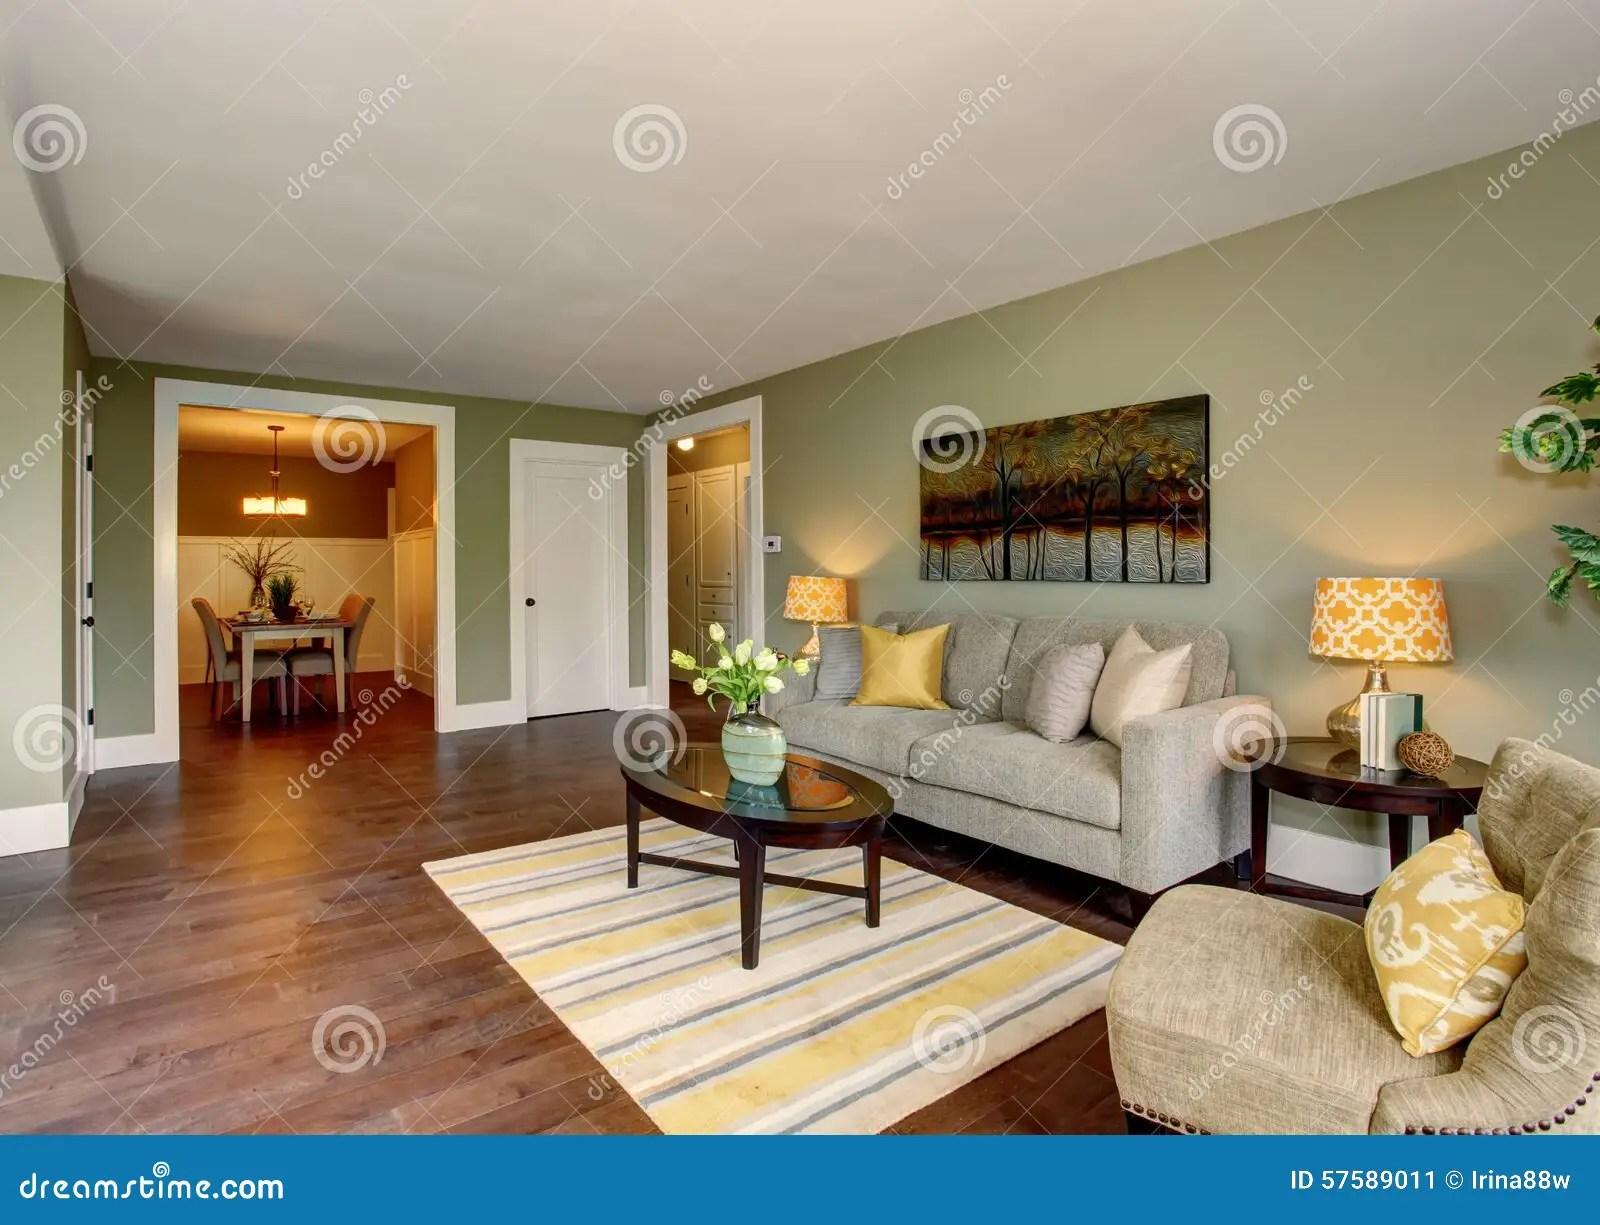 Mooie Woonkamer Met Groen En Geel Thema Stock Afbeelding